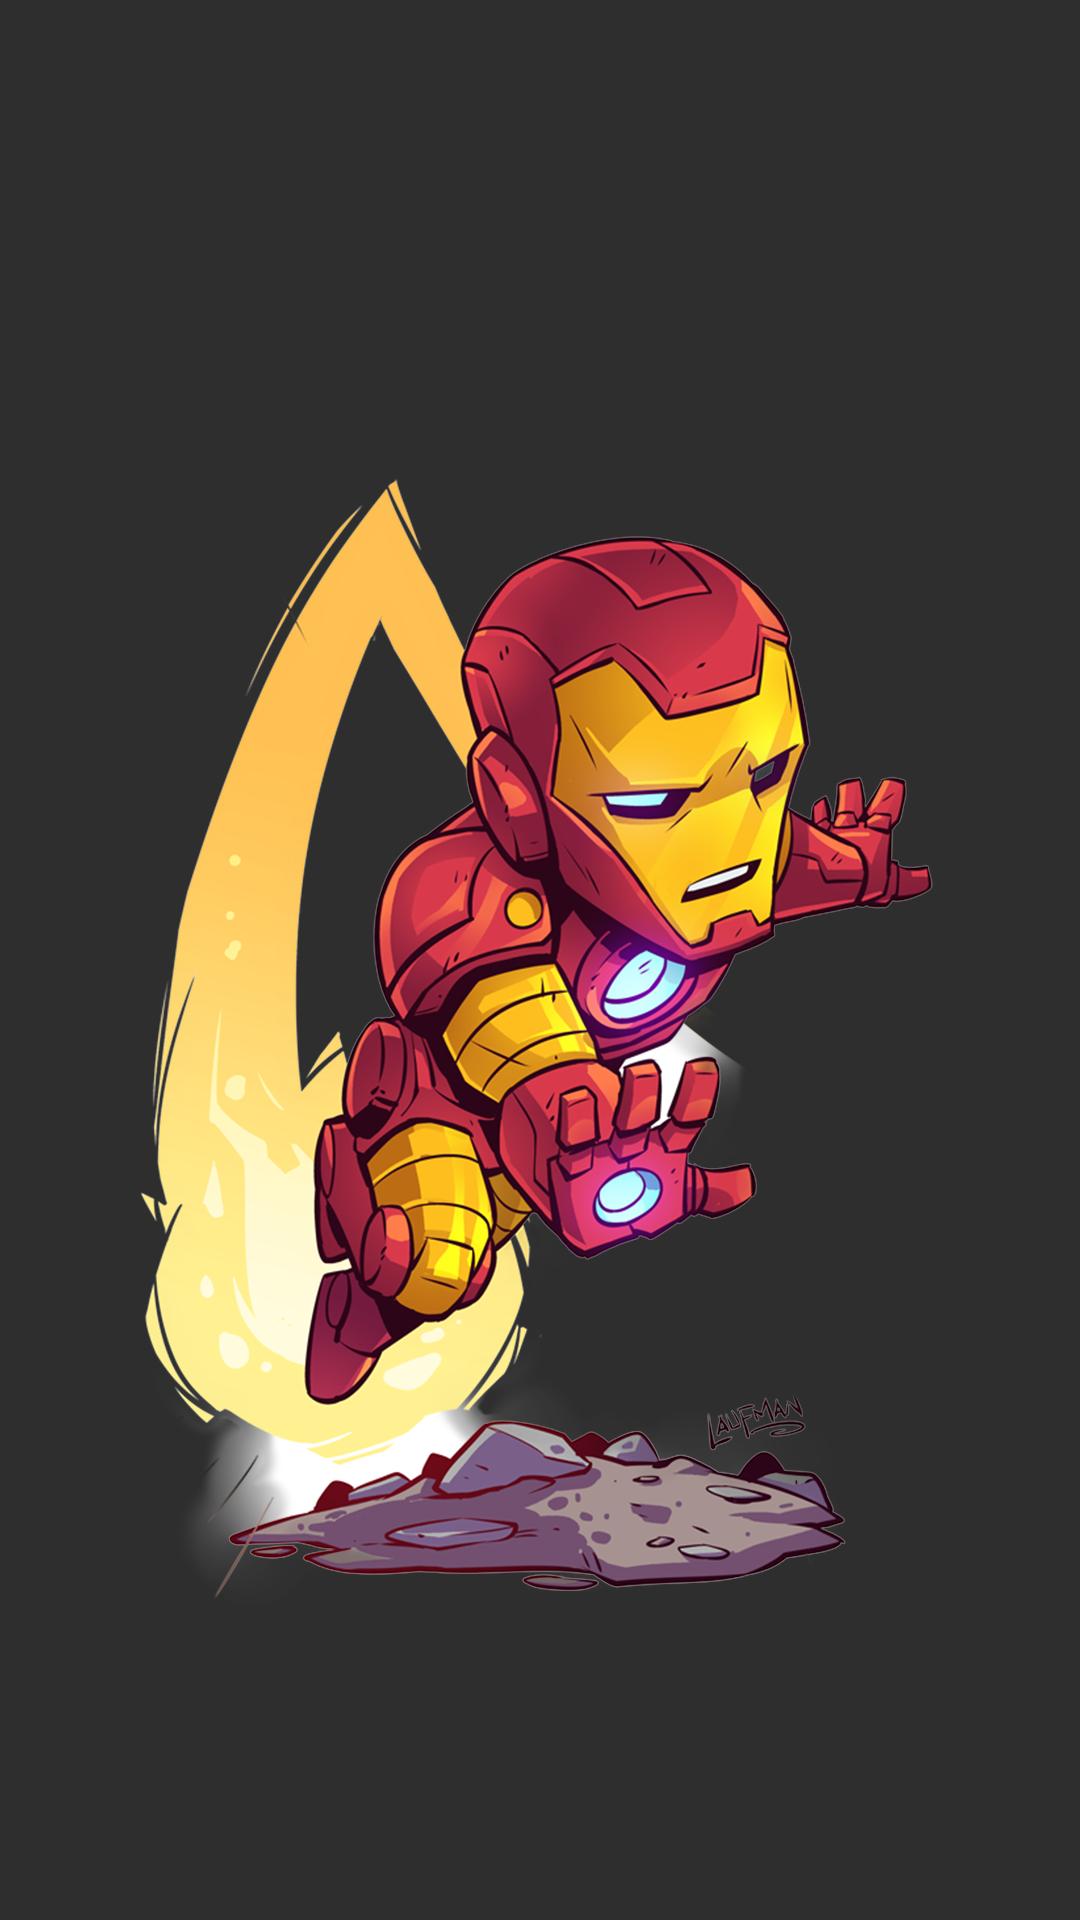 Fond D Ecran Illustration Dessin Anime Super Heros Marvel